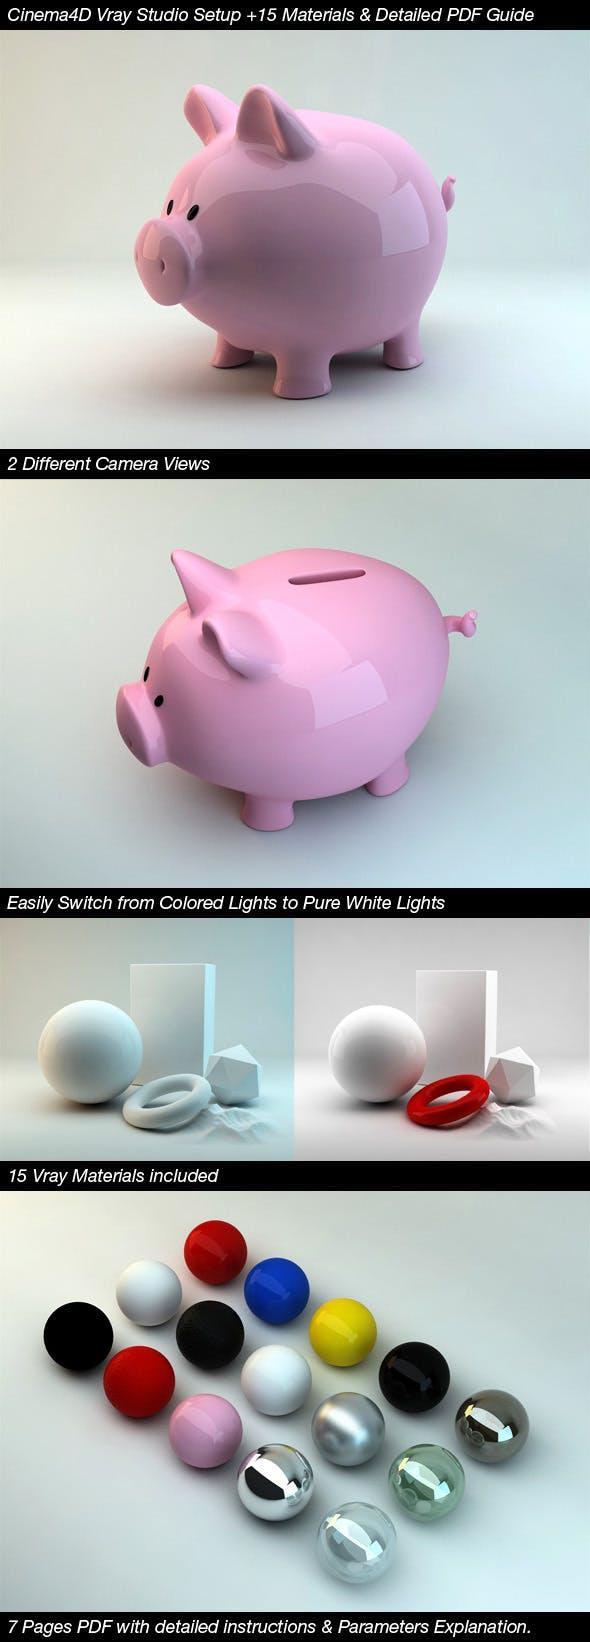 Cinema4D Vray Studio Setup+15 Materials+PDF Guide - 3DOcean Item for Sale